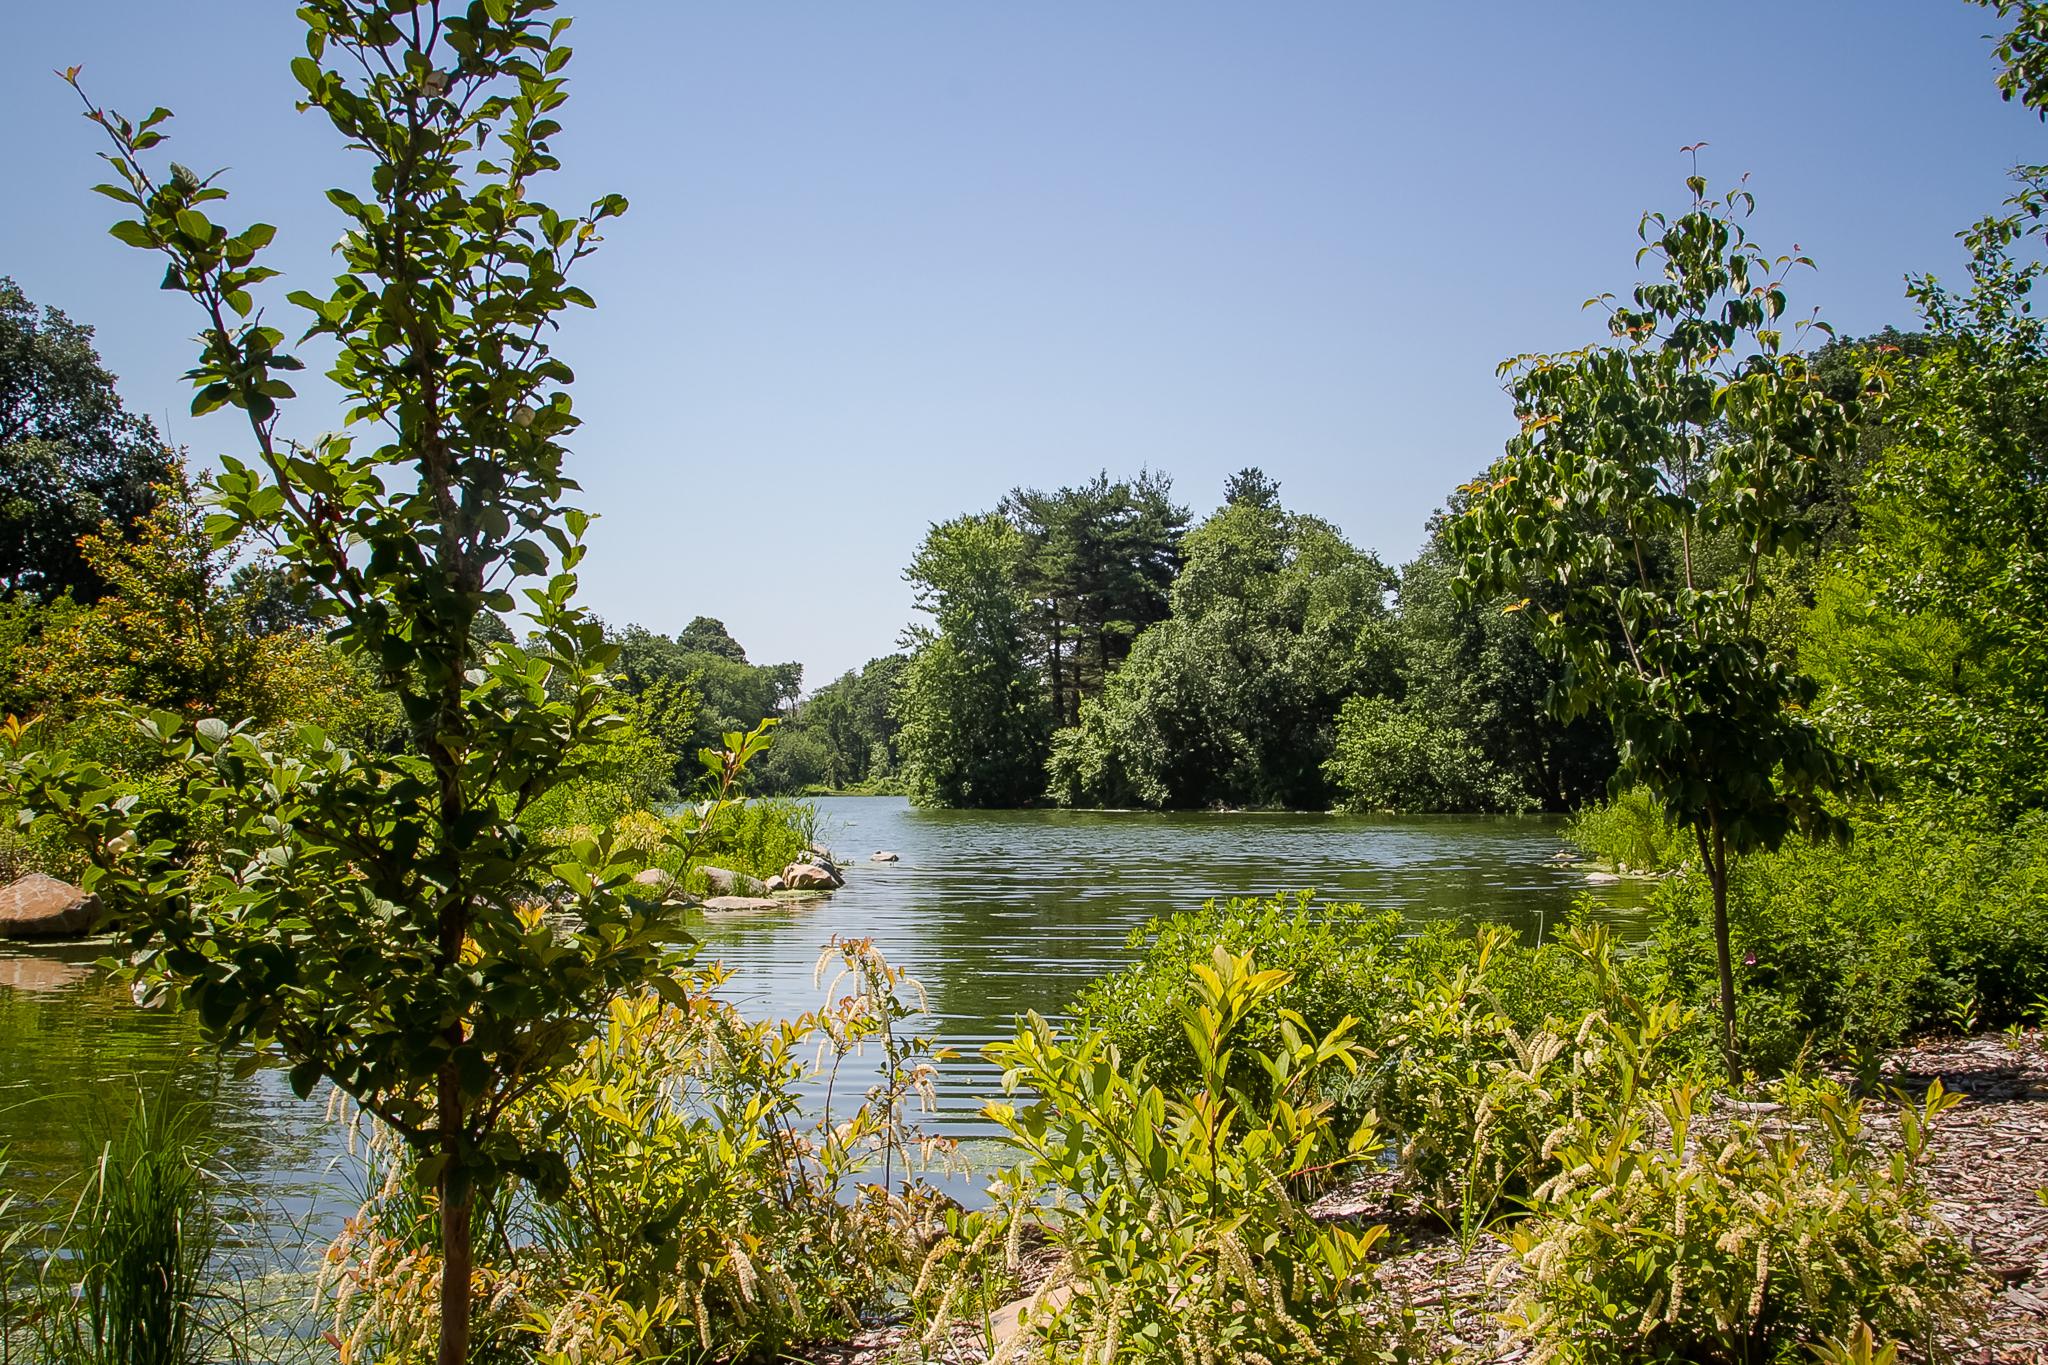 Lakeside at Prospect Park